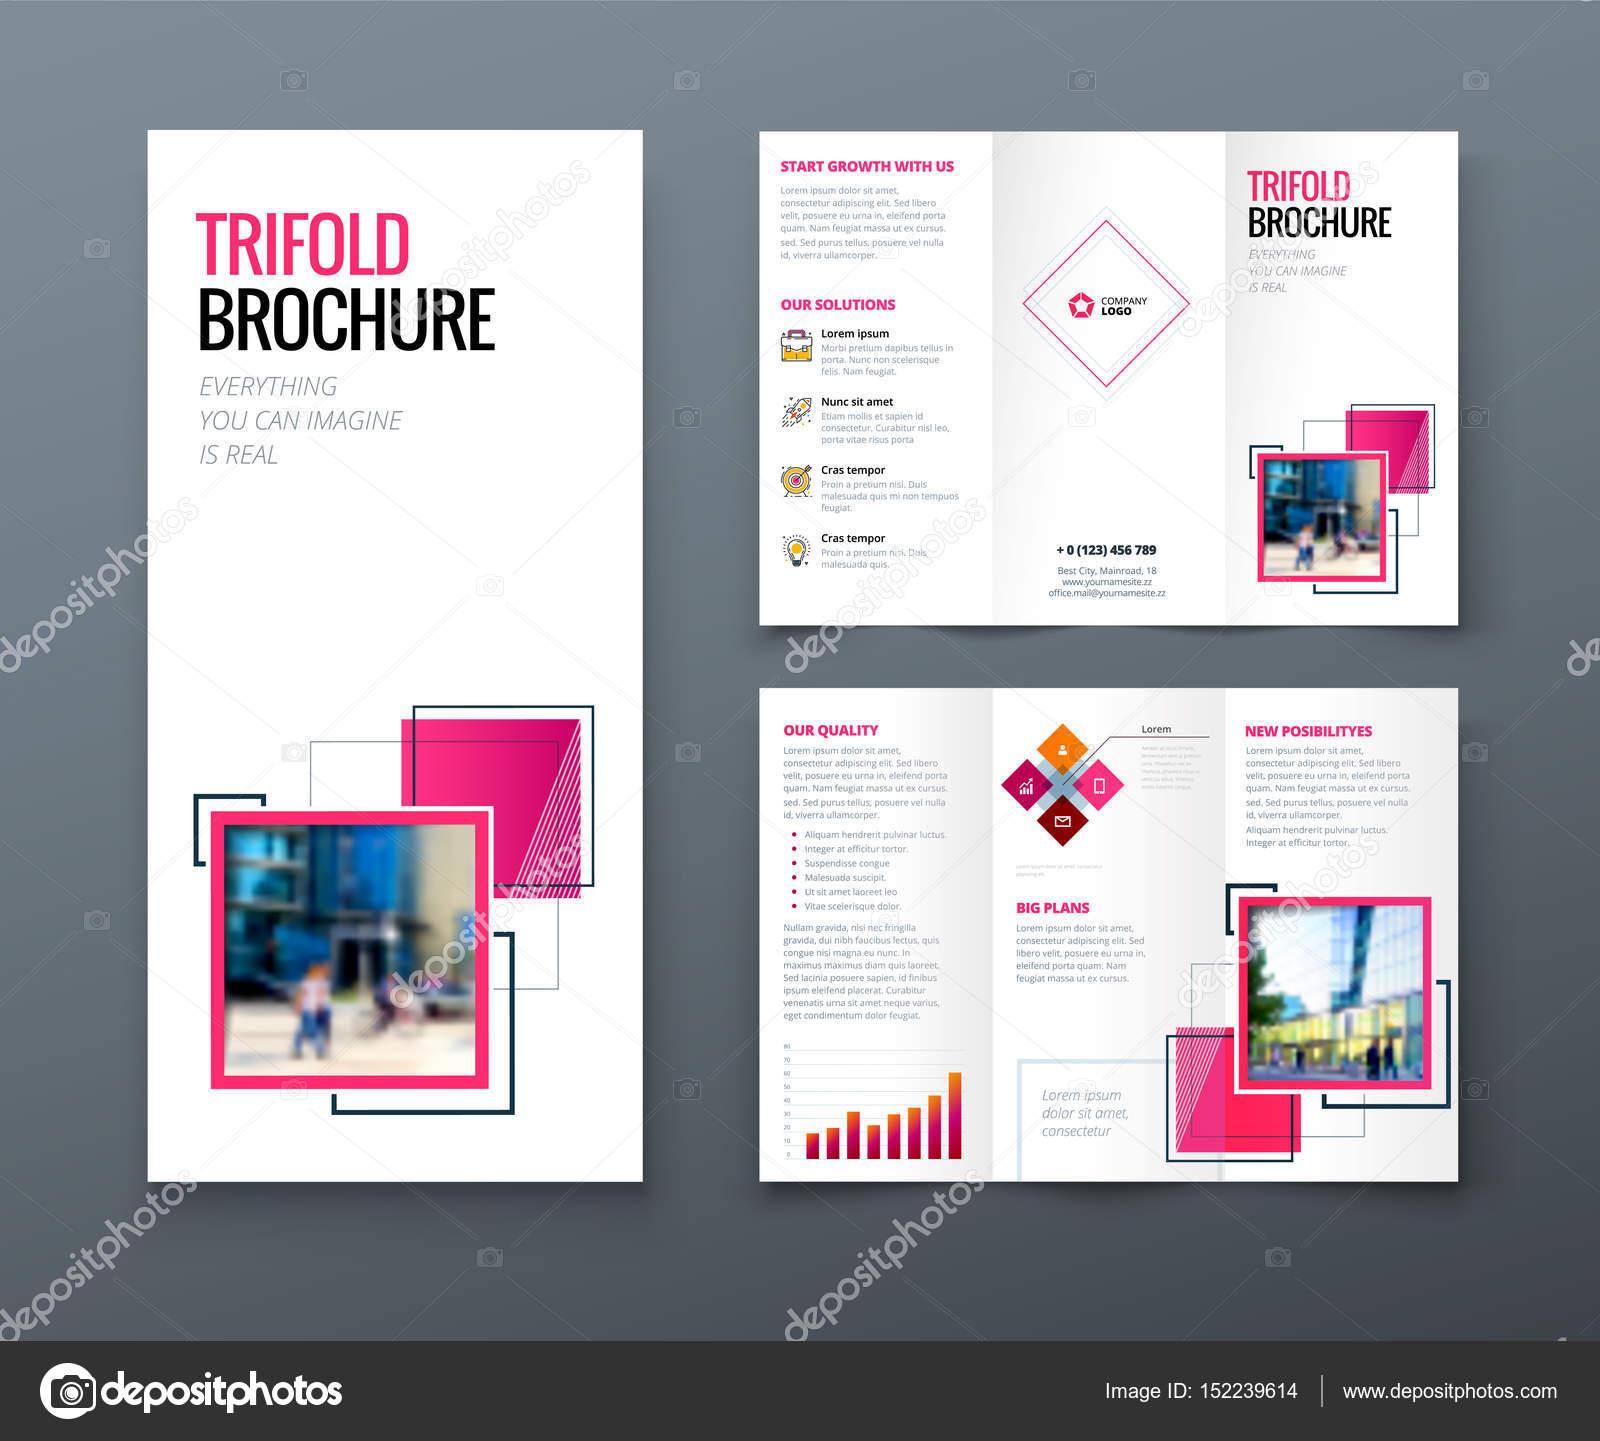 tri fold brochure design corporate business template for tri fold